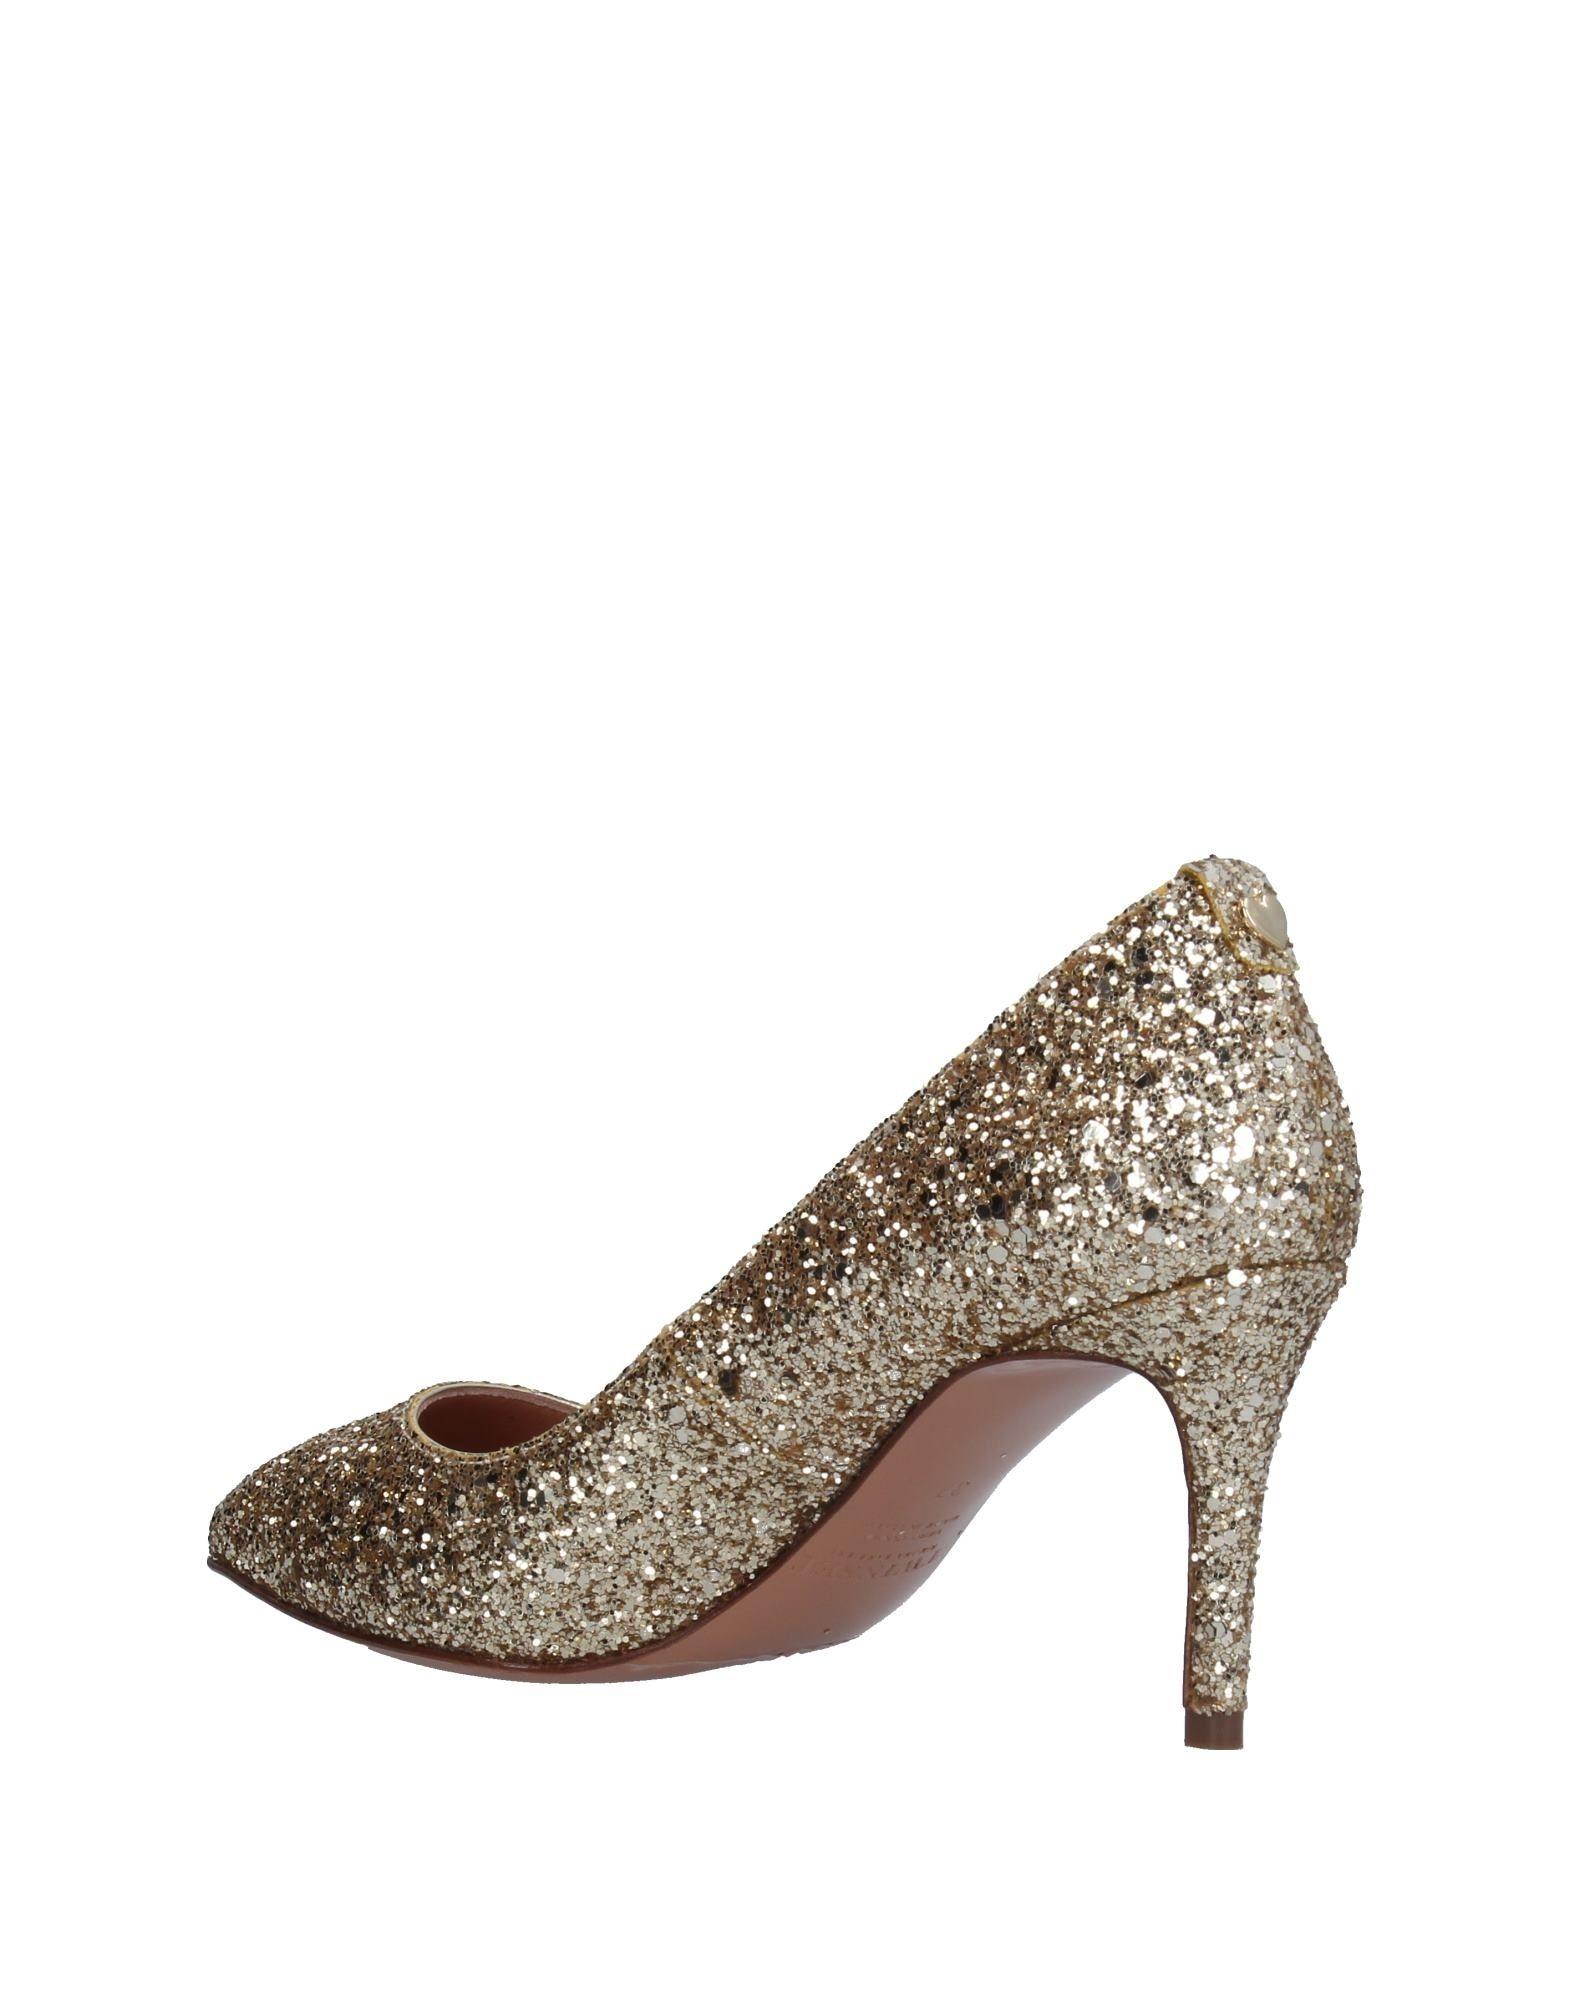 Haltbare Mode Beliebte billige Schuhe Twin 11280643OF Beliebte Mode Schuhe 31f6c5